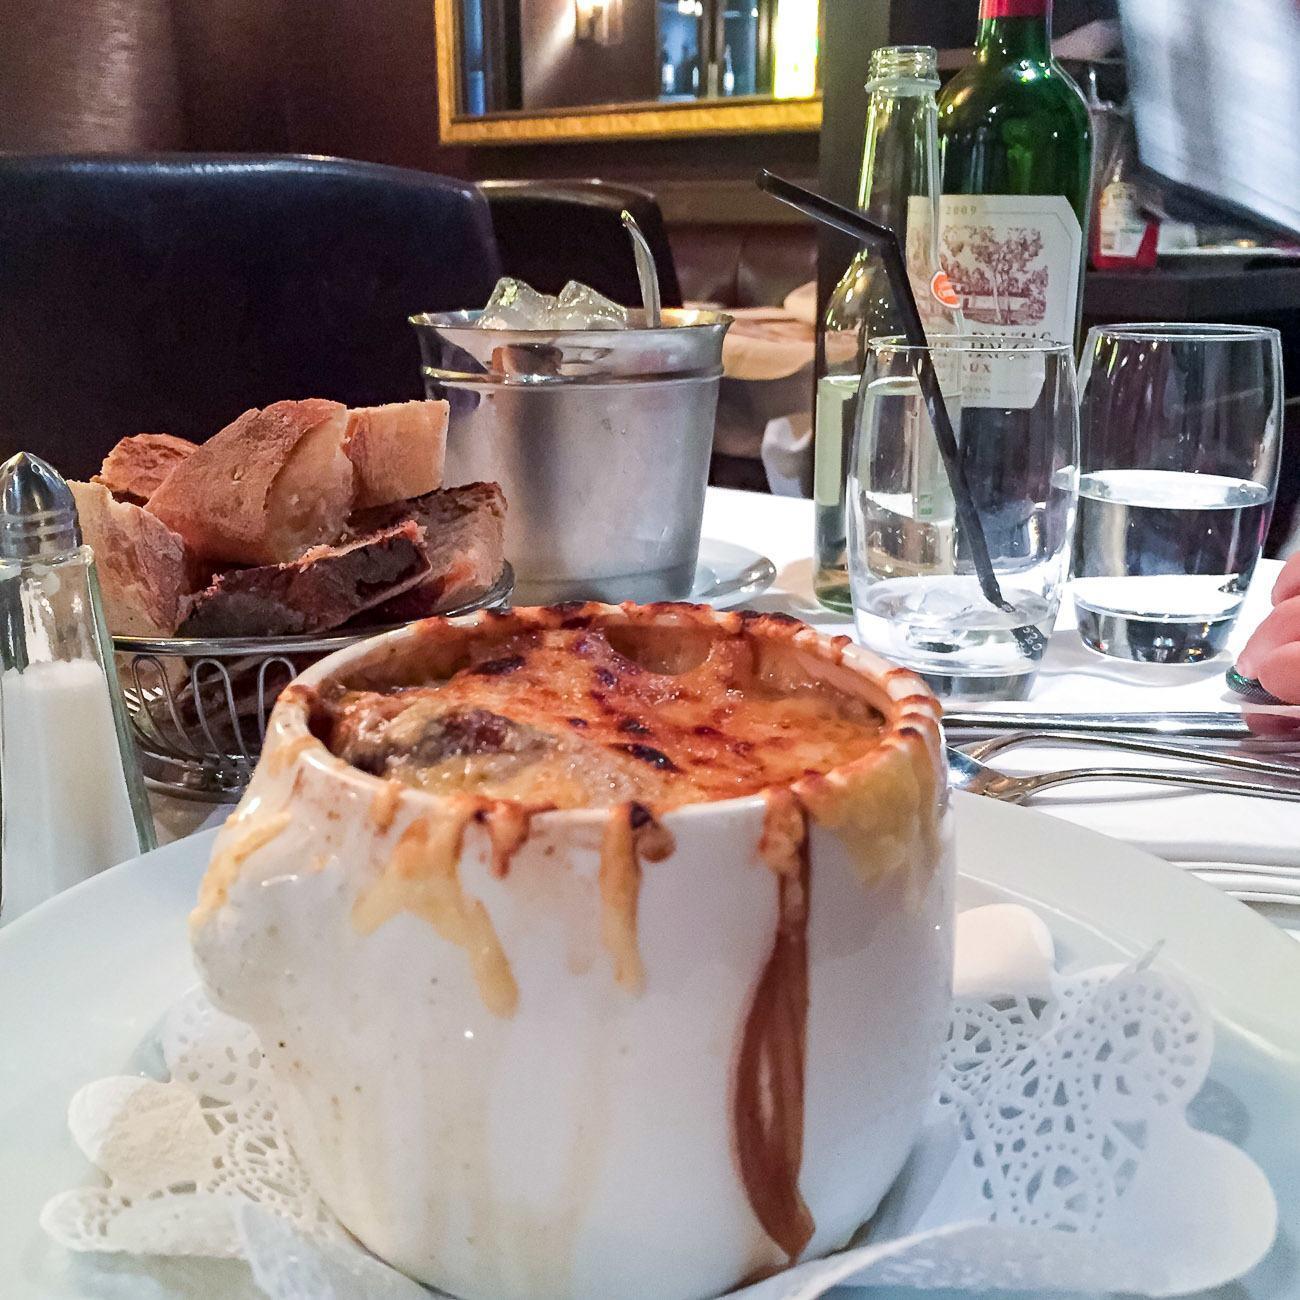 French onion soup at a Paris brasserie called Chez Flottes